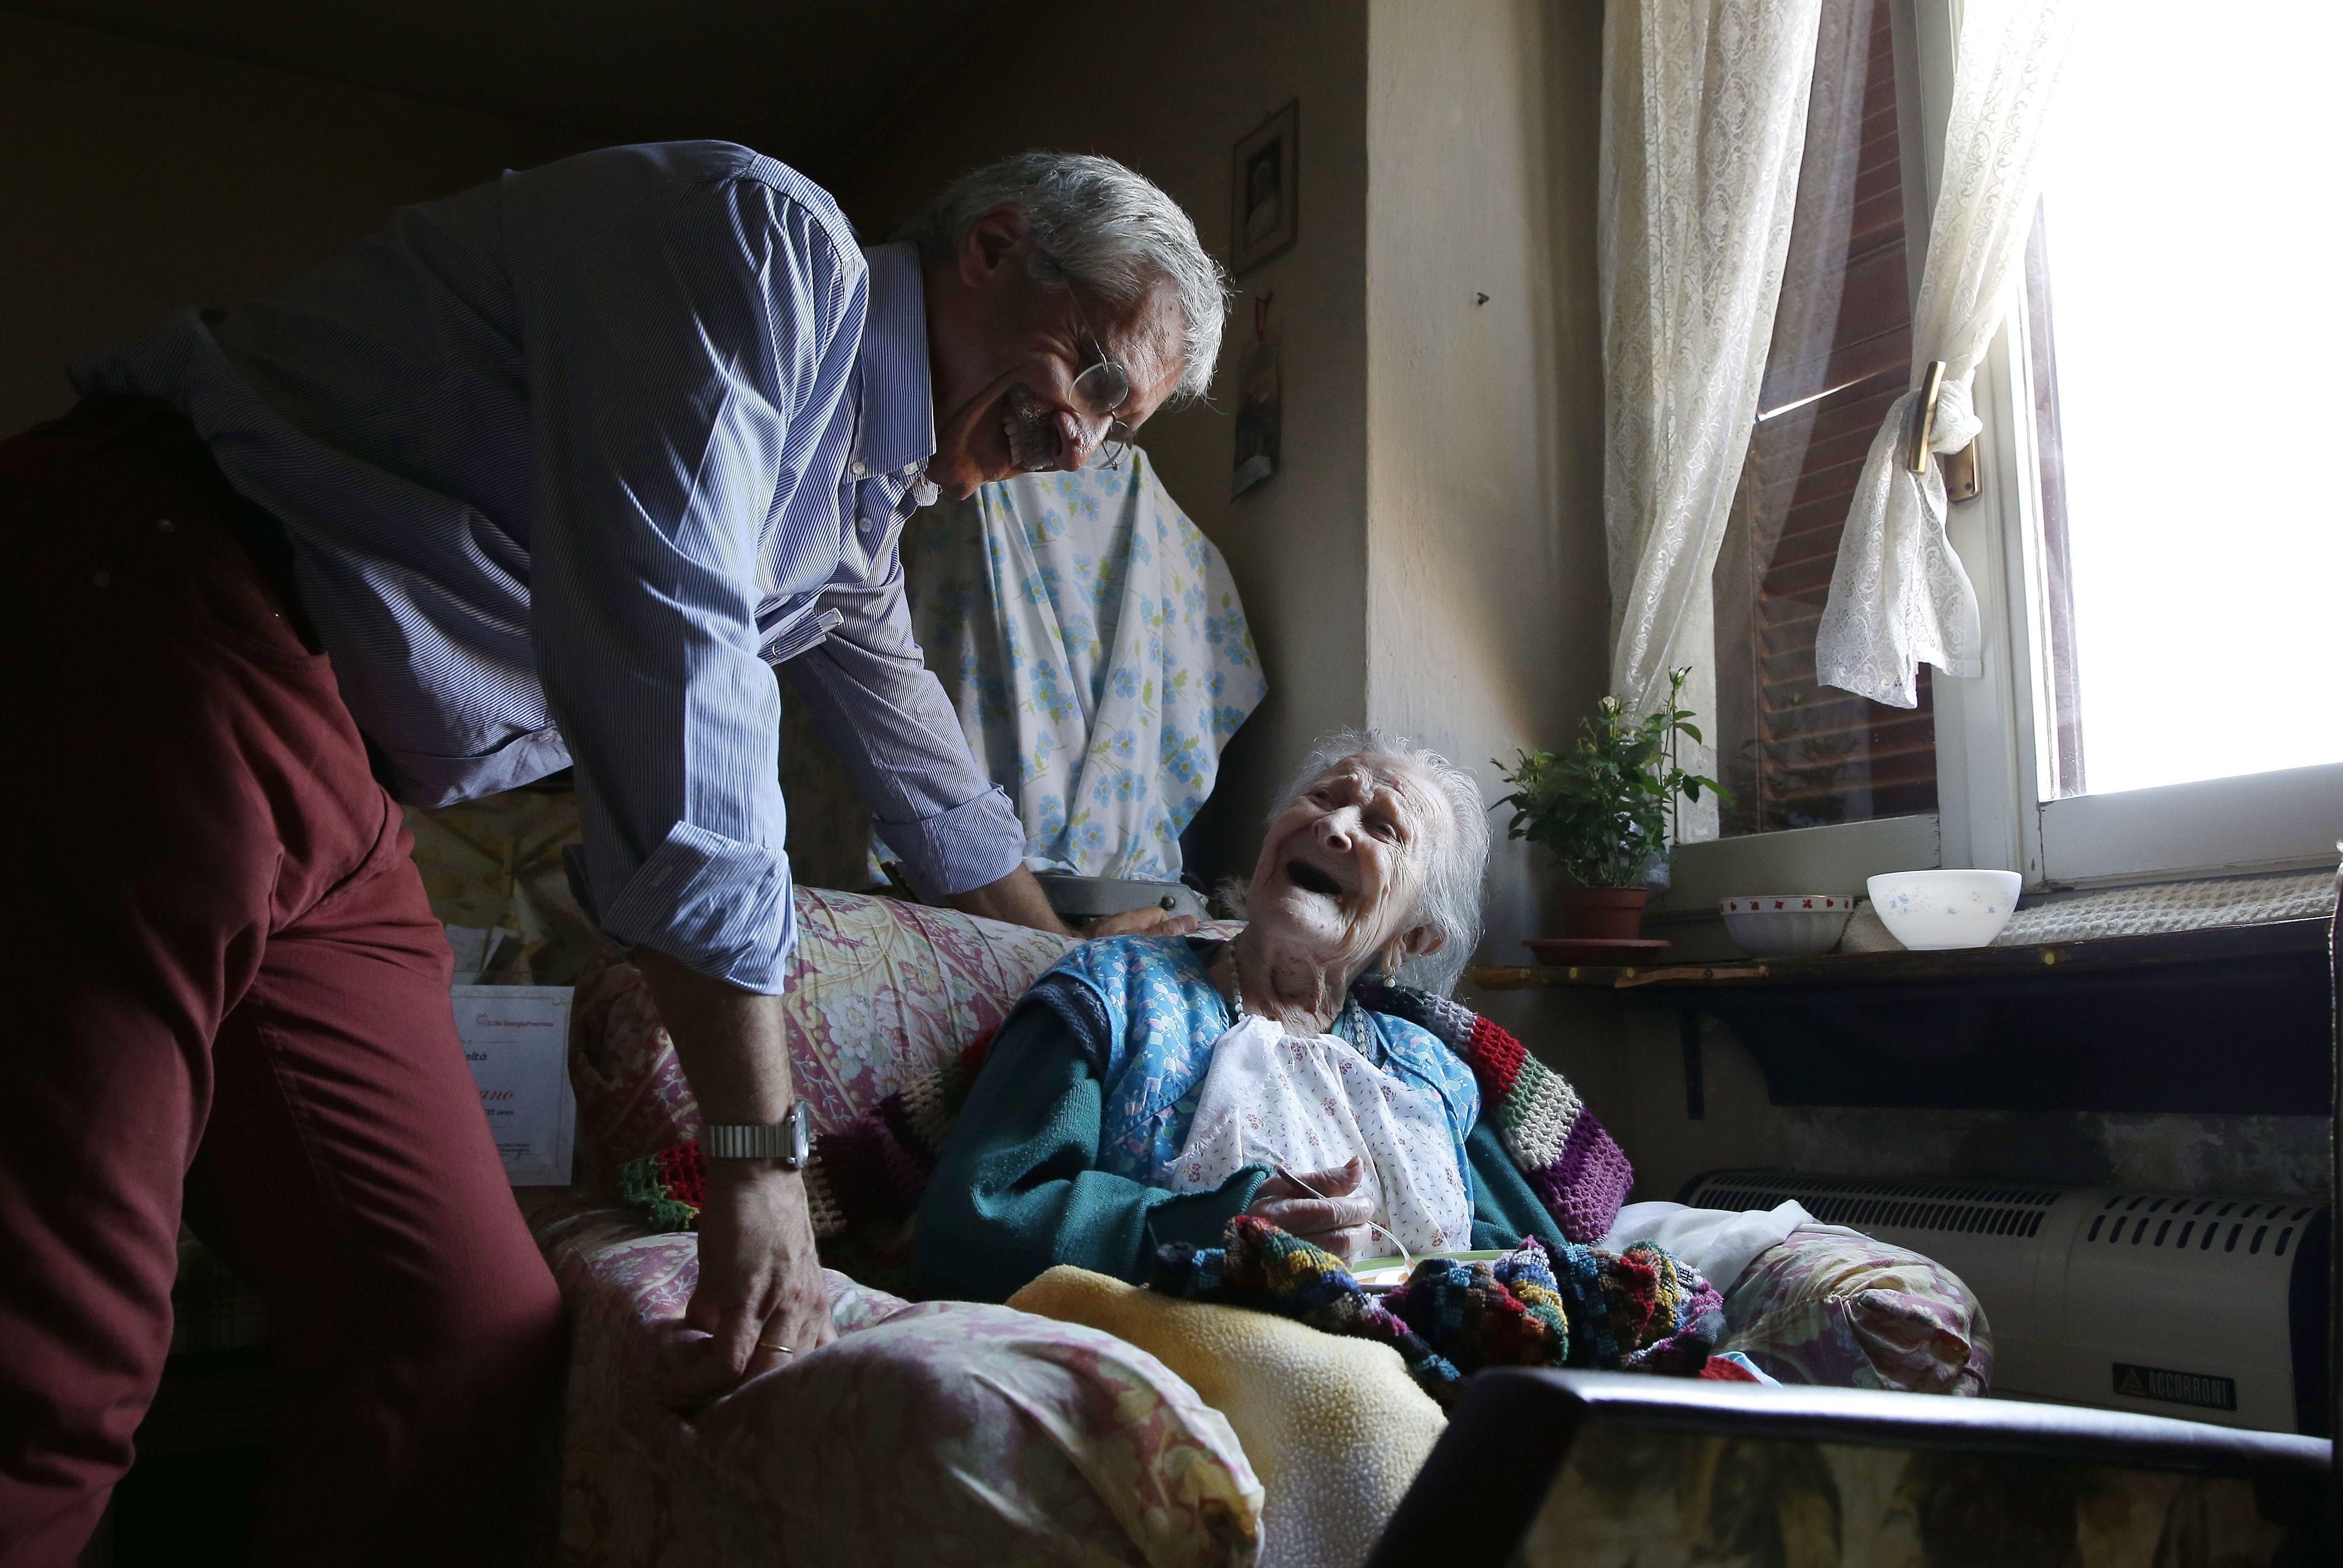 Dia disakiti suami dan memilih hidup sendiri